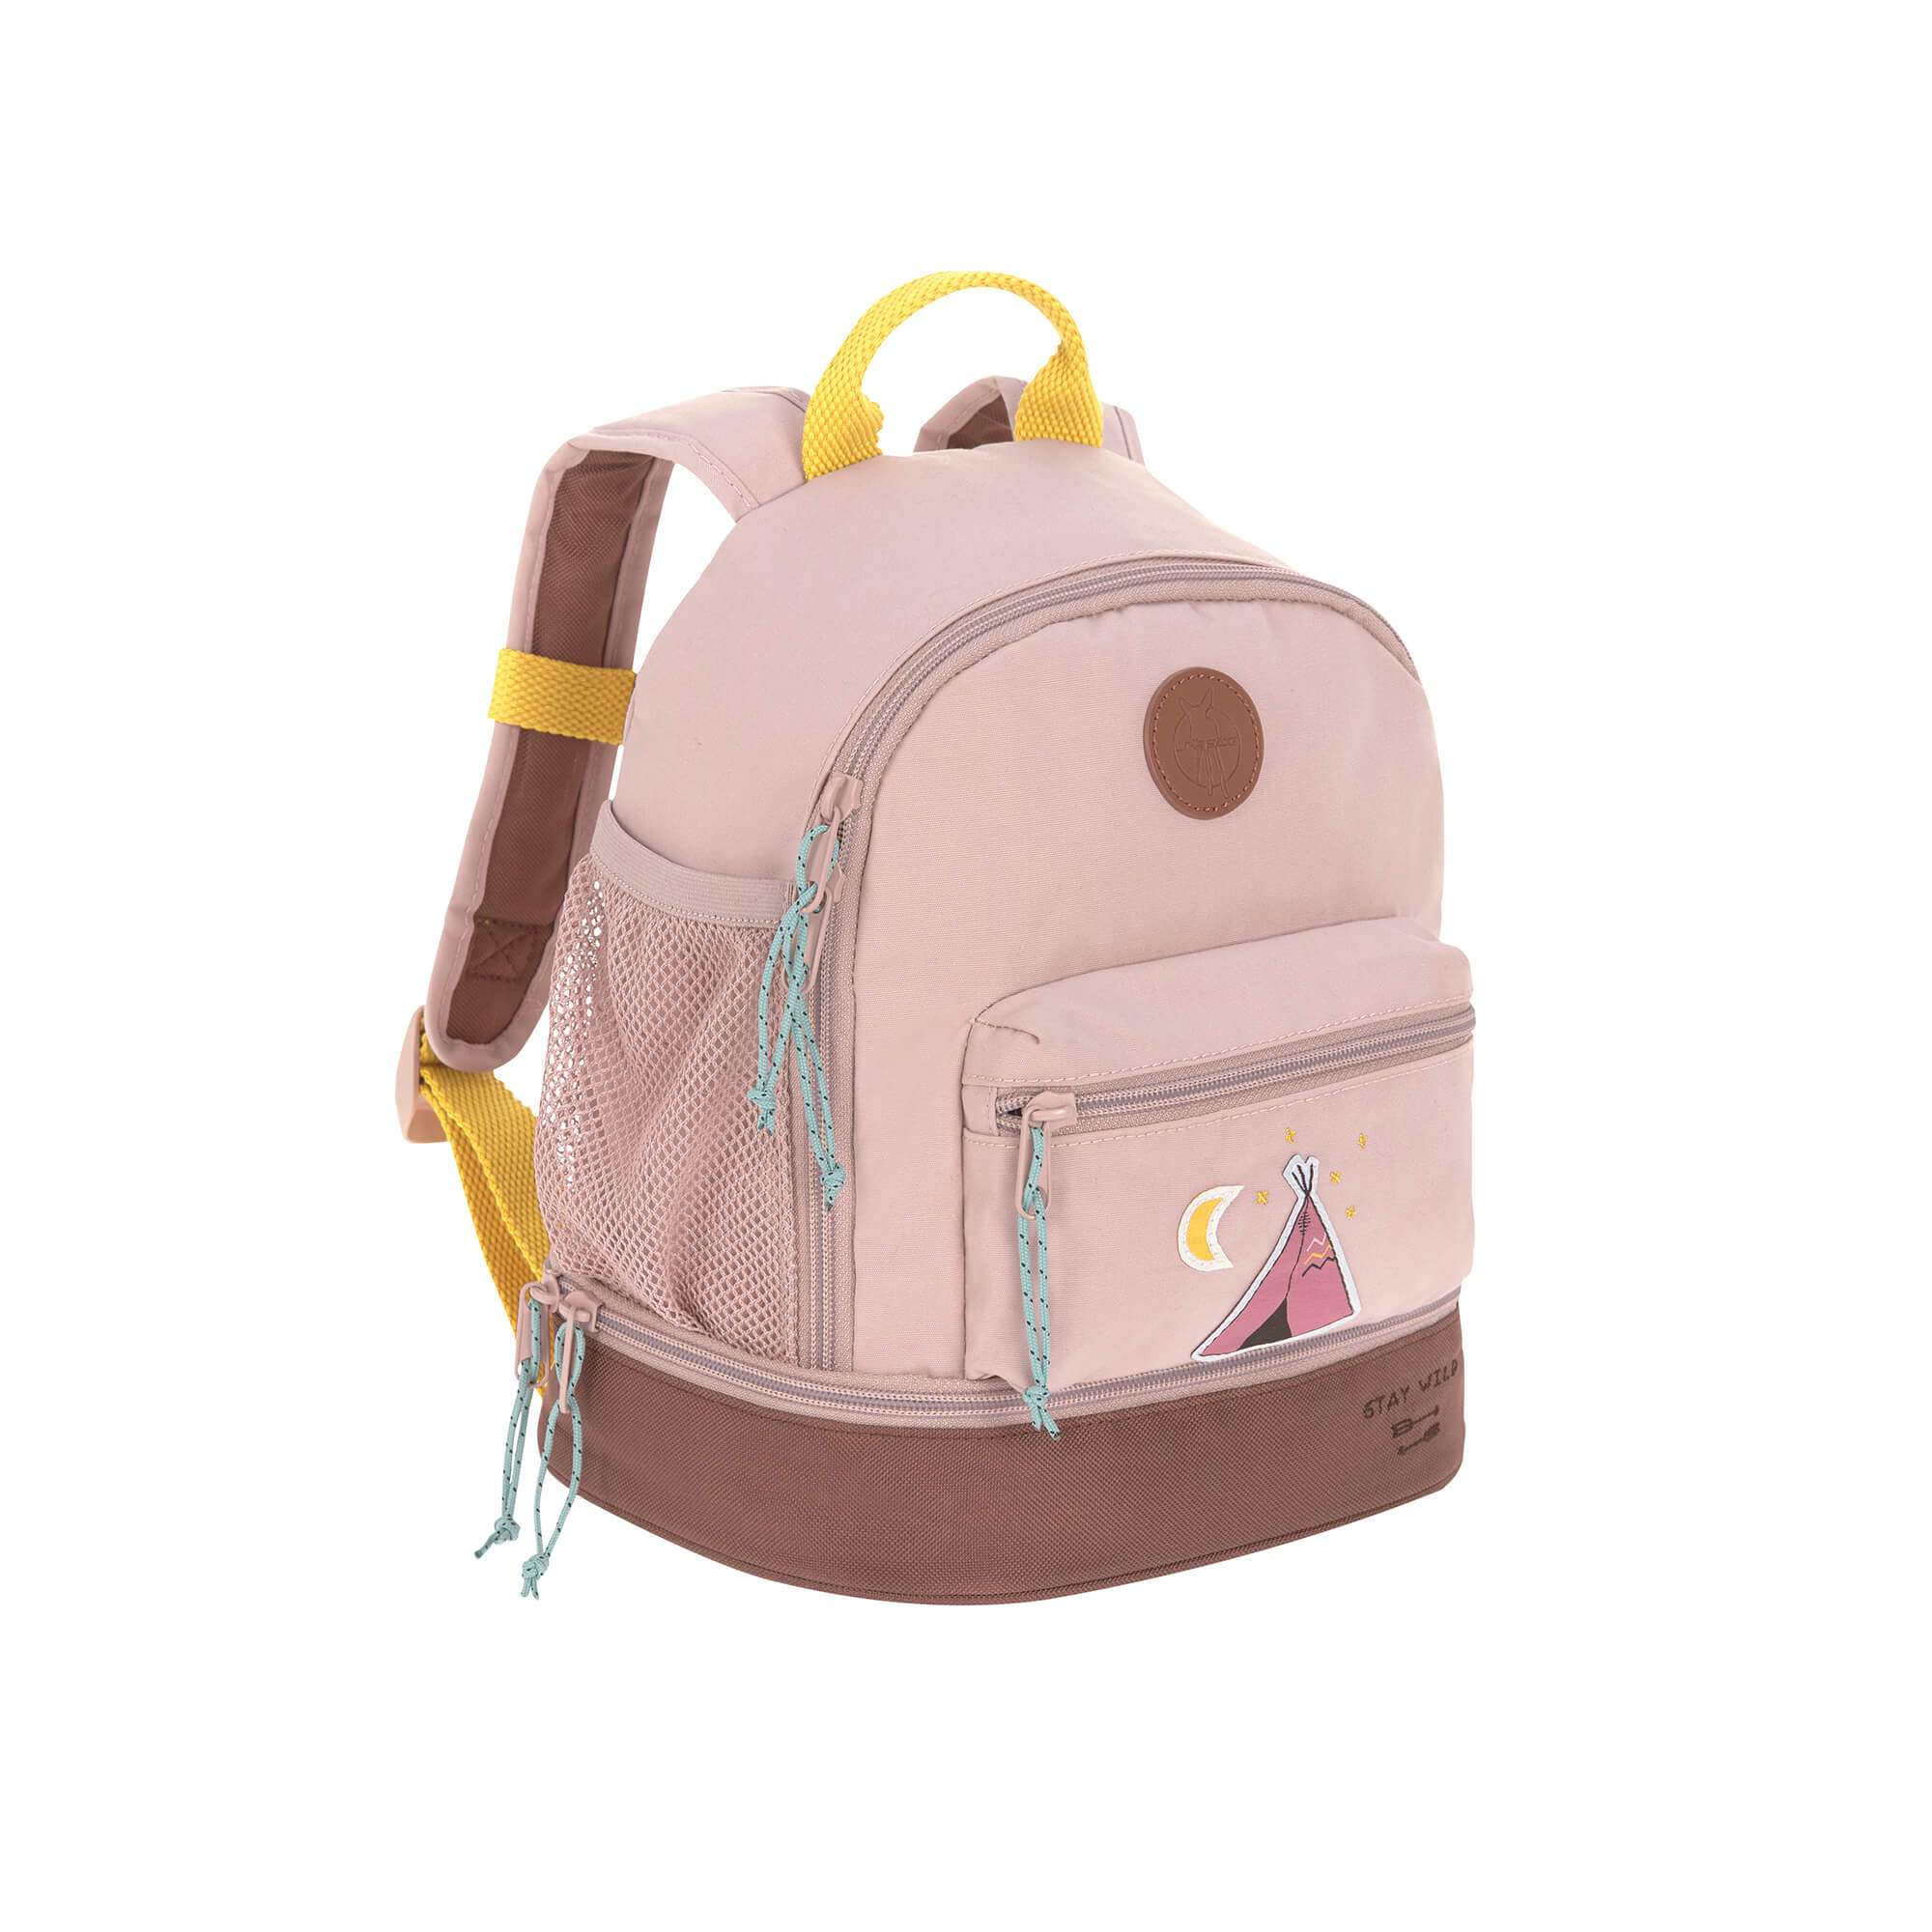 286cd60d5909f Lässig Kindergartenrucksack - Mini Backpack Adventure Tipi